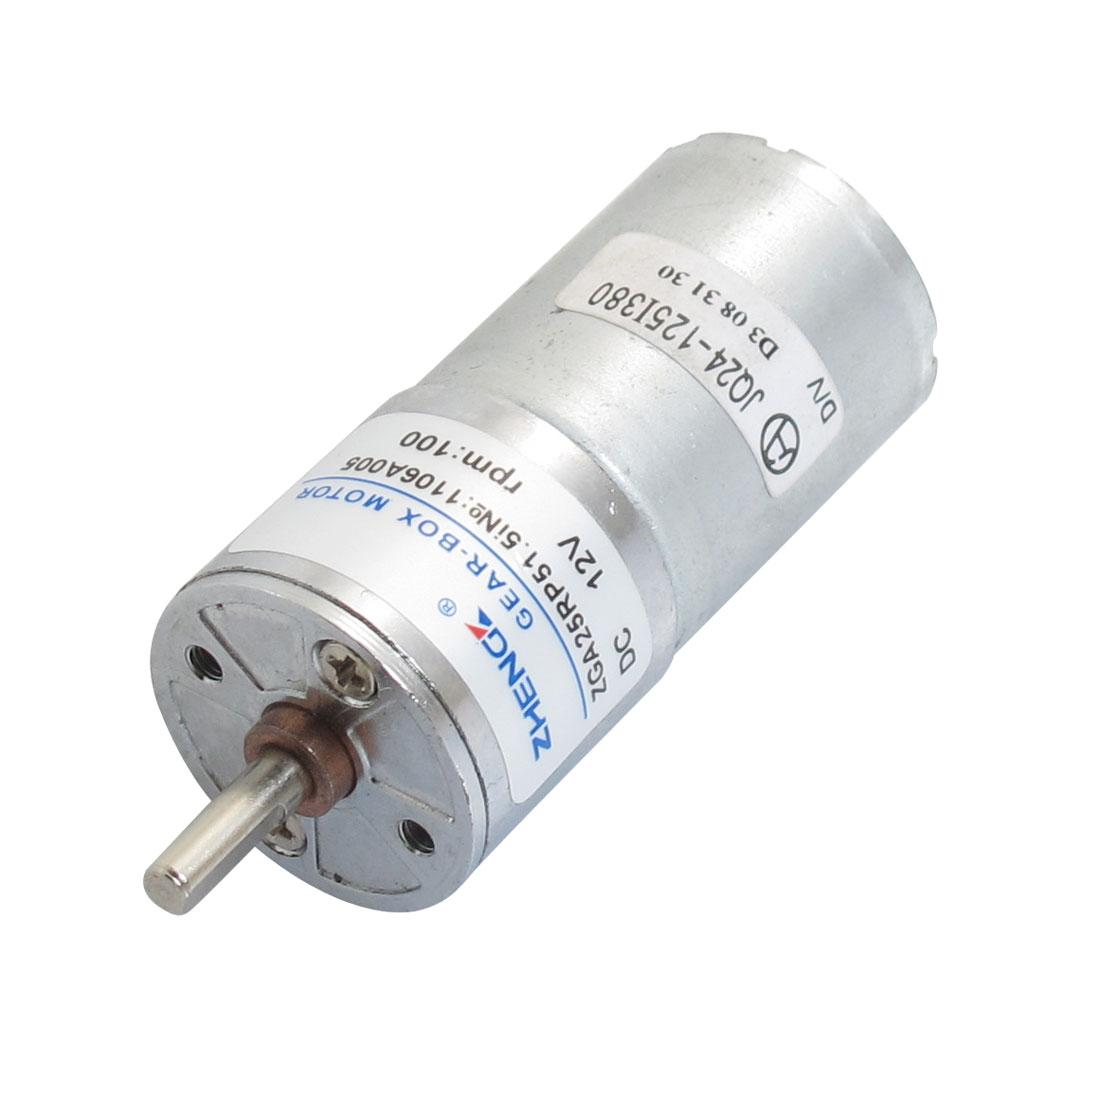 4mm Shaft Diameter Cylinder Shape Electric Gear Motor 2P 12VDC 100RPM